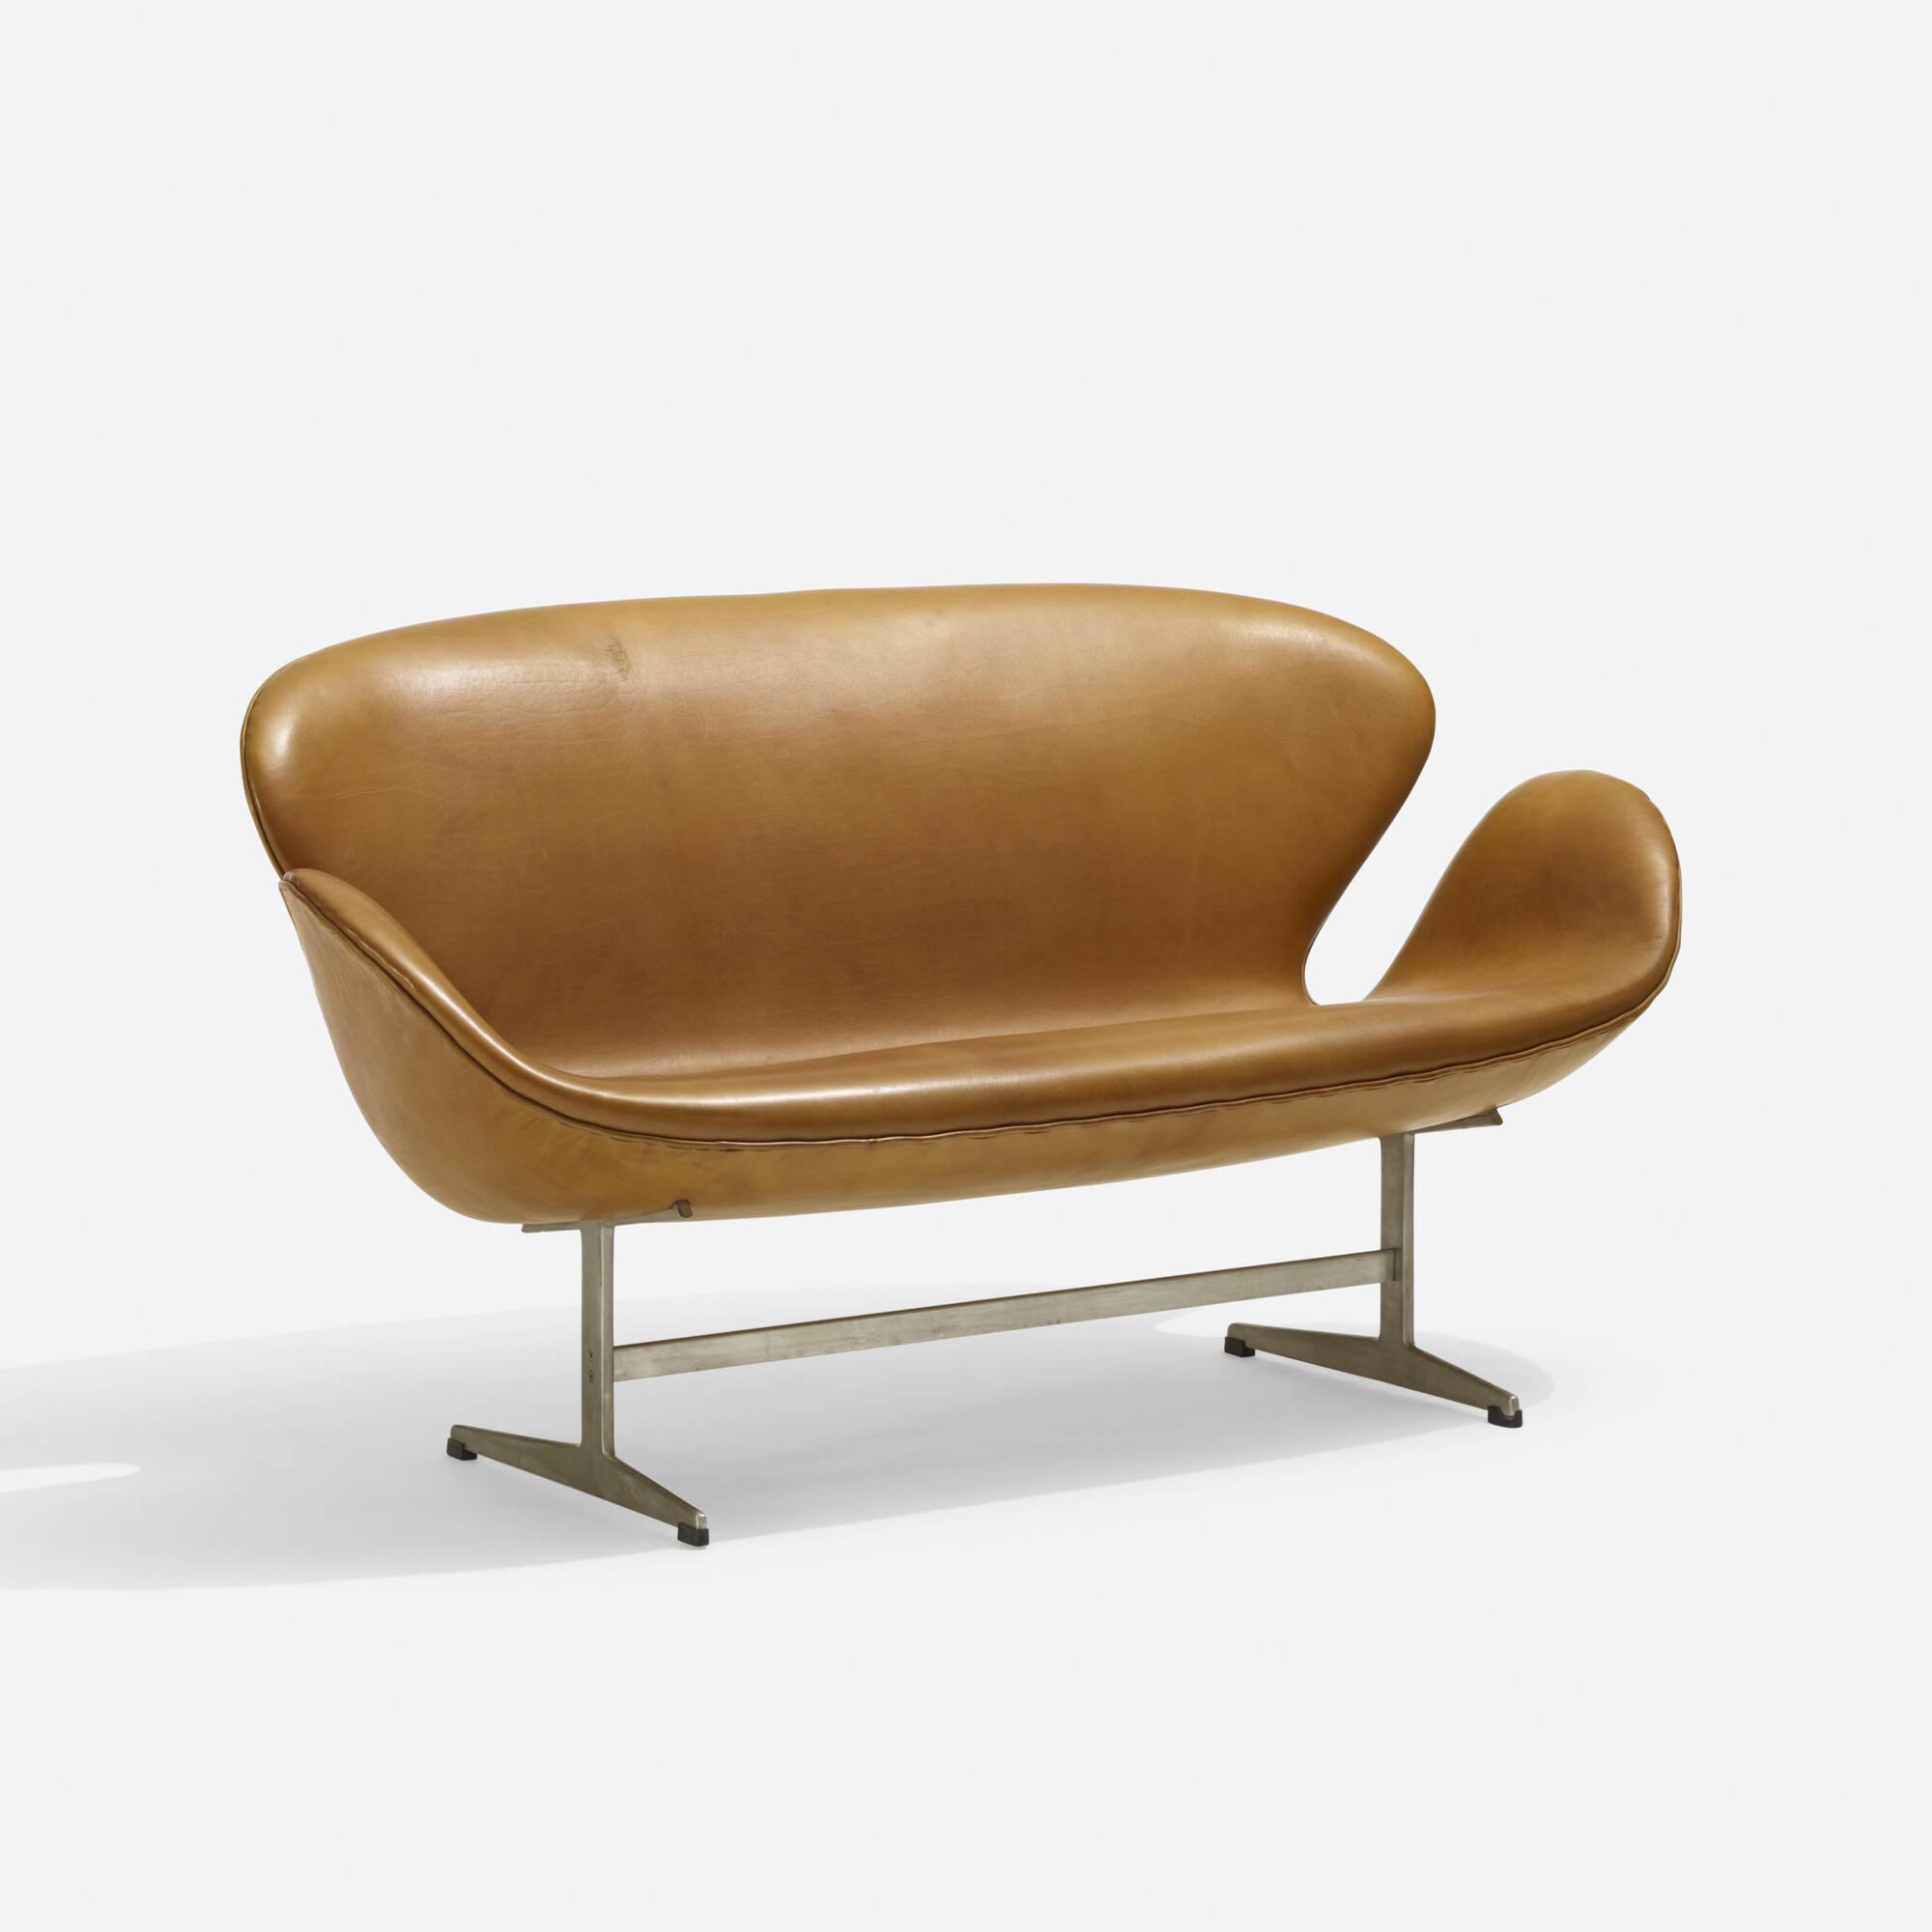 106: Arne Jacobsen / Swan settee, model 3321 (2 of 5)